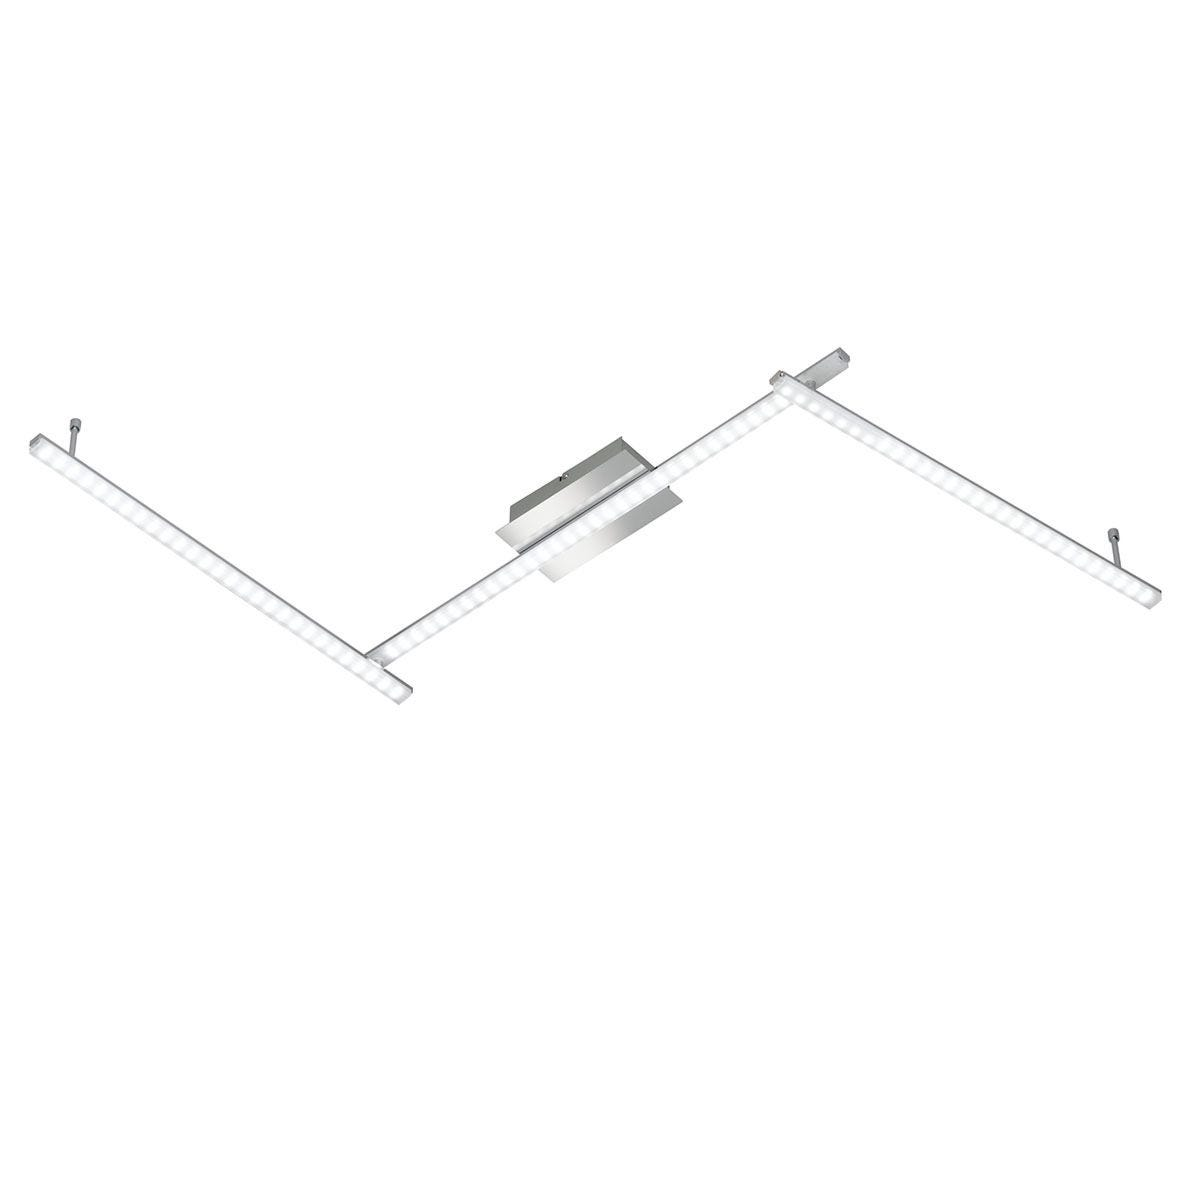 Wofi Clay 3 LED Ceiling Lamp - Chrome